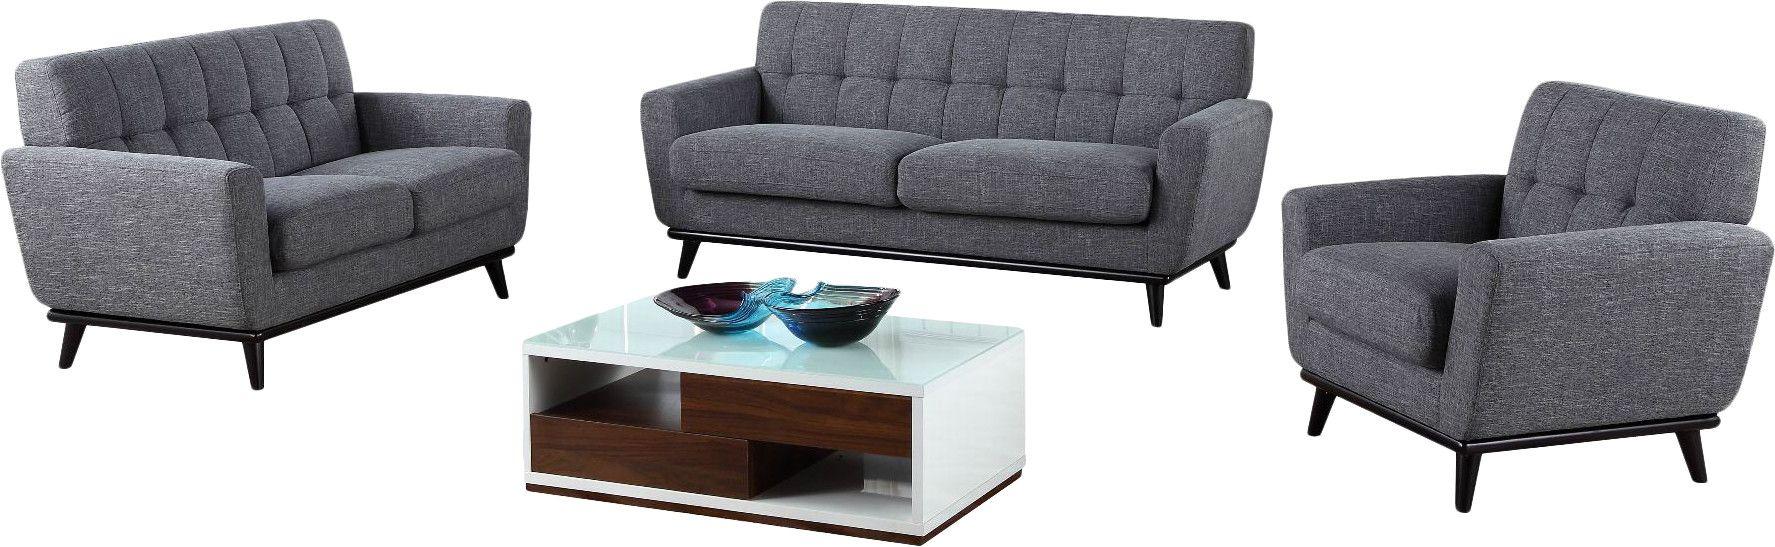 Bandera 3 Piece Living Room Set